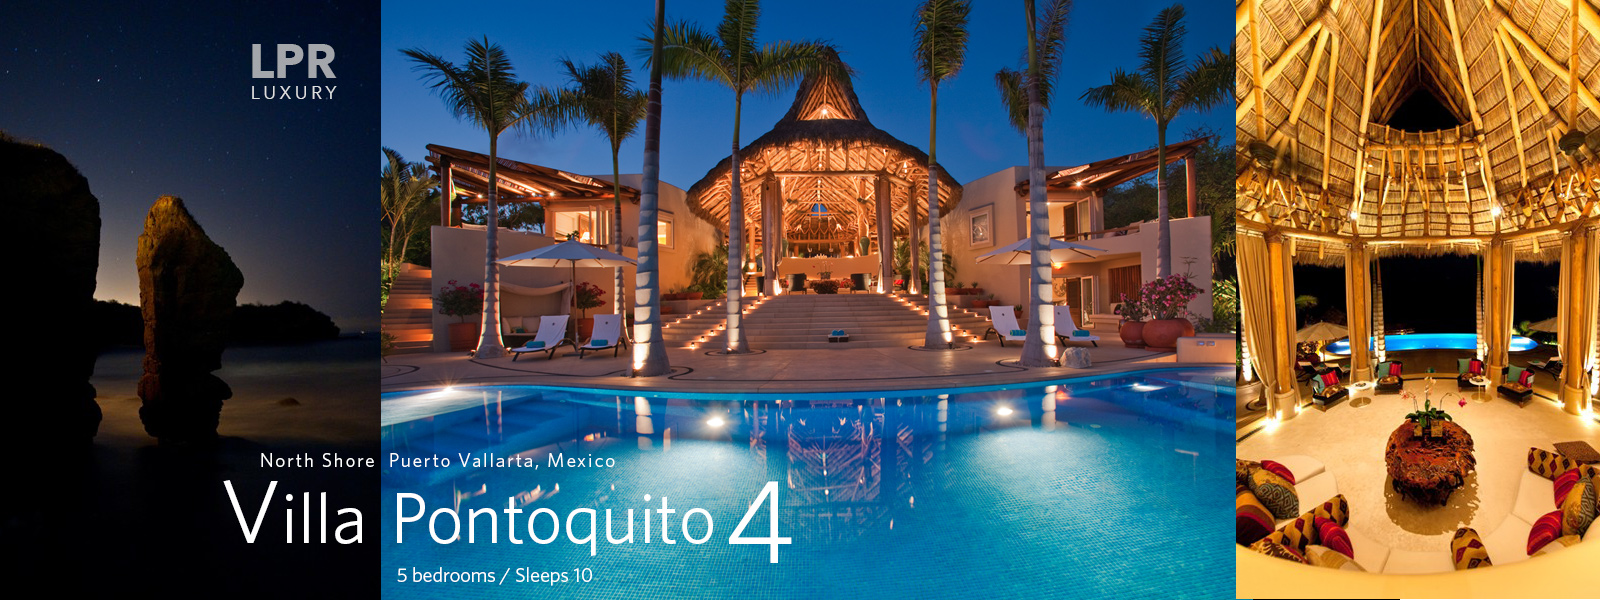 Villa Pontoquito 4 - Luxury Puerto Vallarta Real Estate